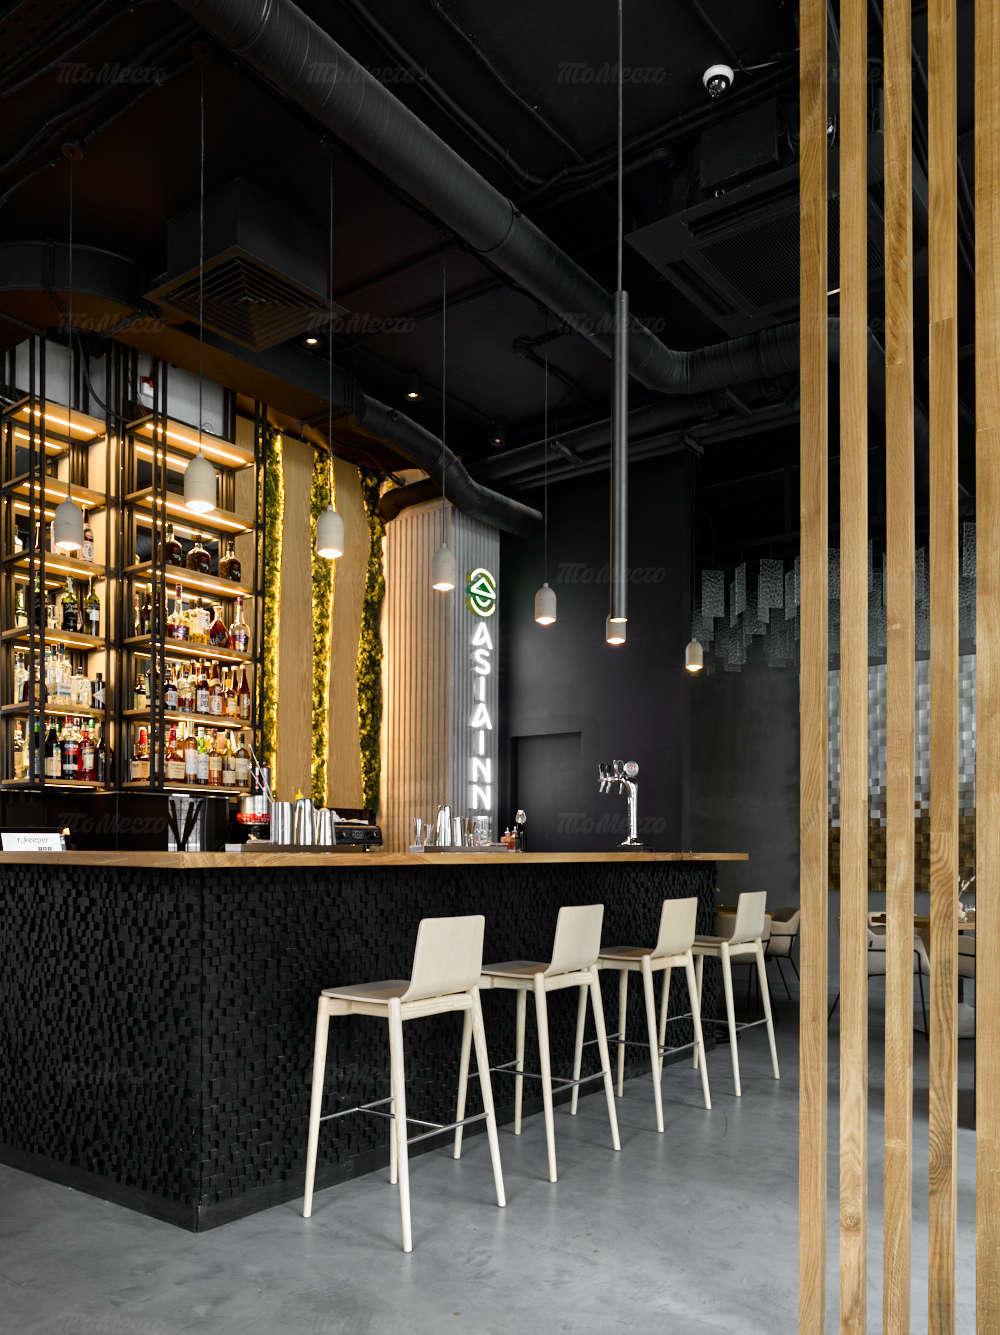 Ресторан Asia Inn (Азиа Инн) на бульваре Генерала Карбышева фото 6